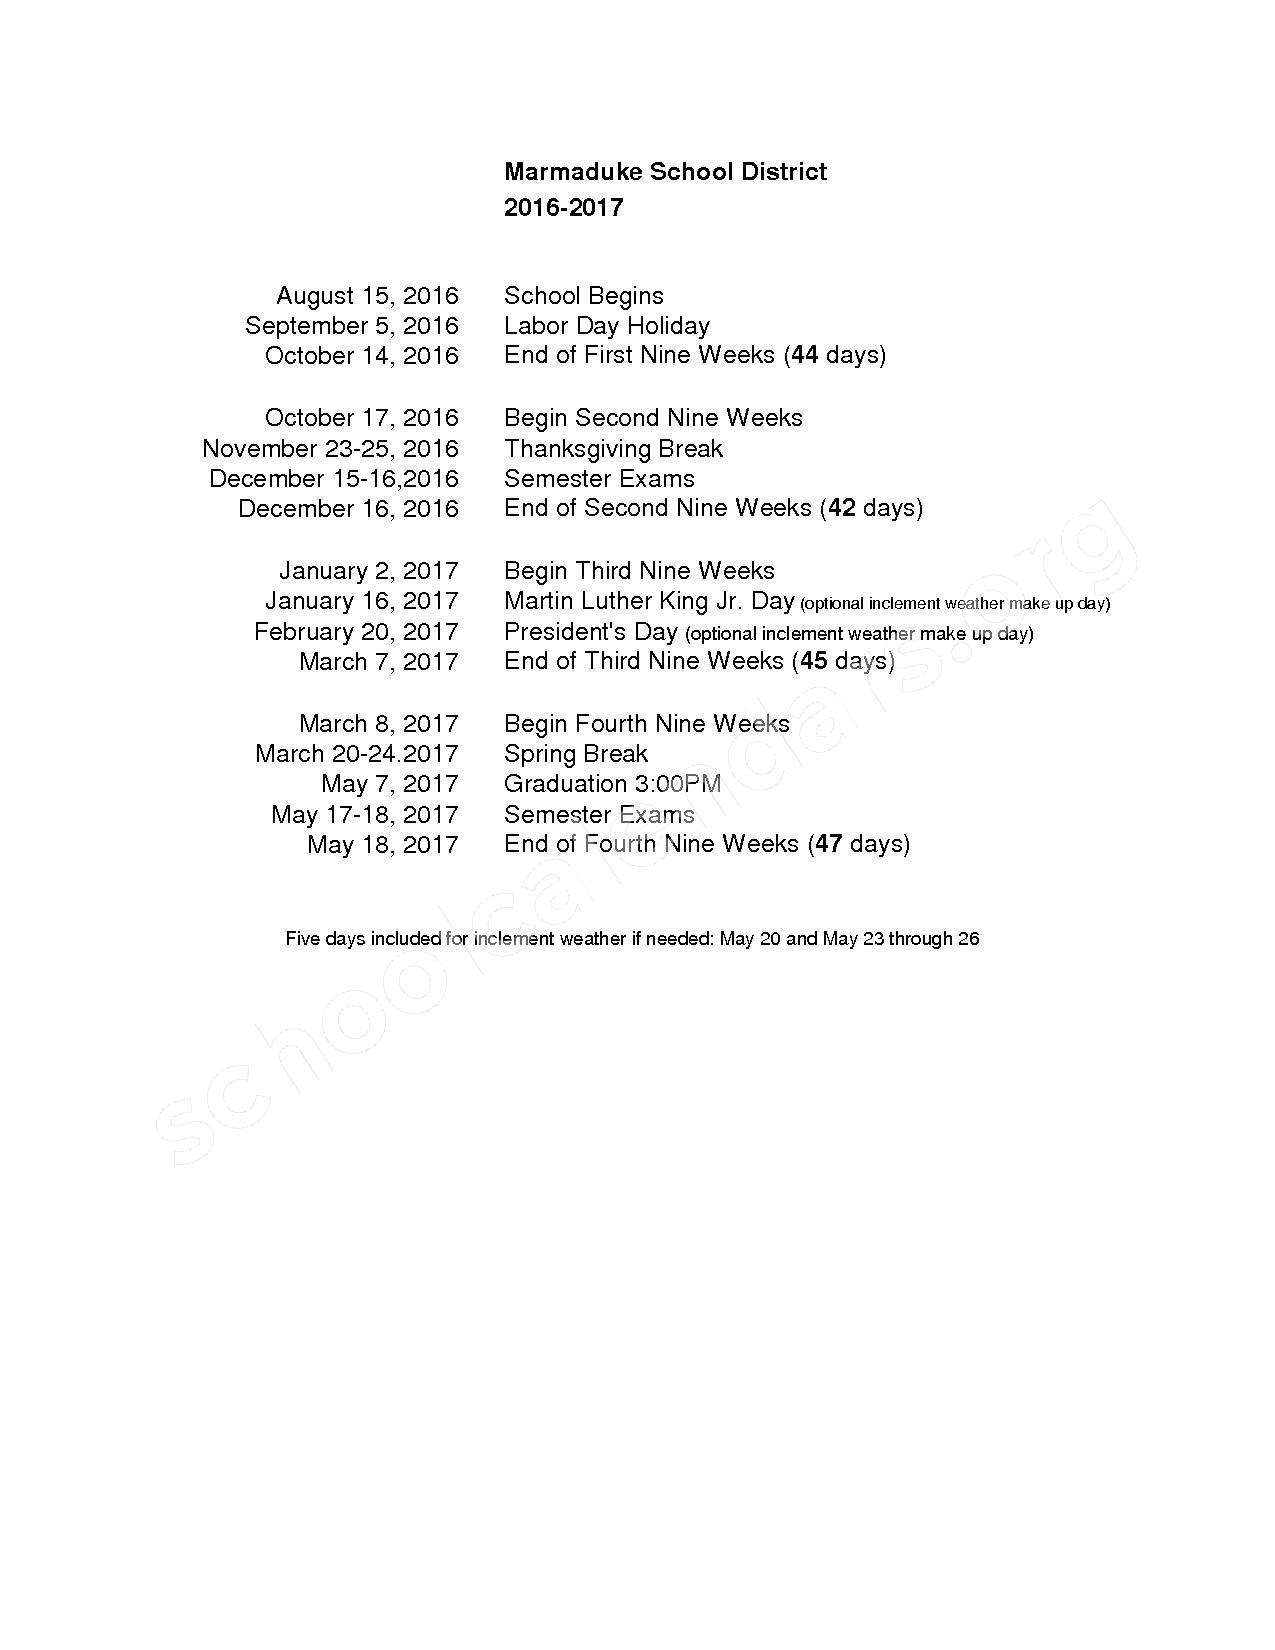 2016 - 2017 School Calendar – Marmaduke School District – page 1